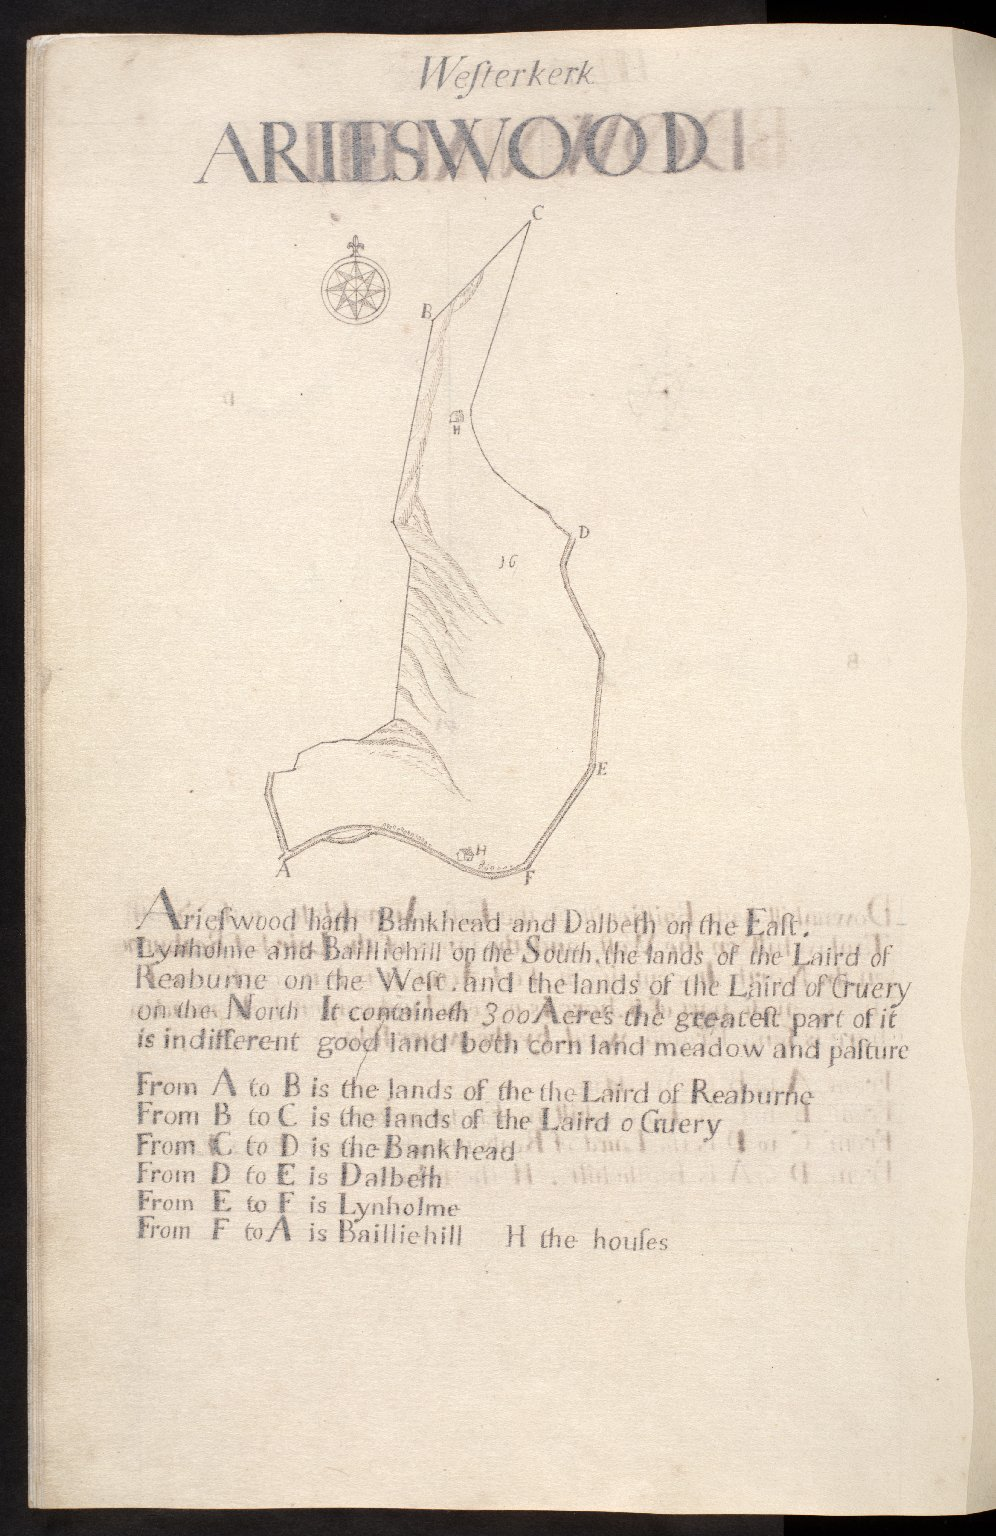 Westerkerk : Arieswood [1 of 1]